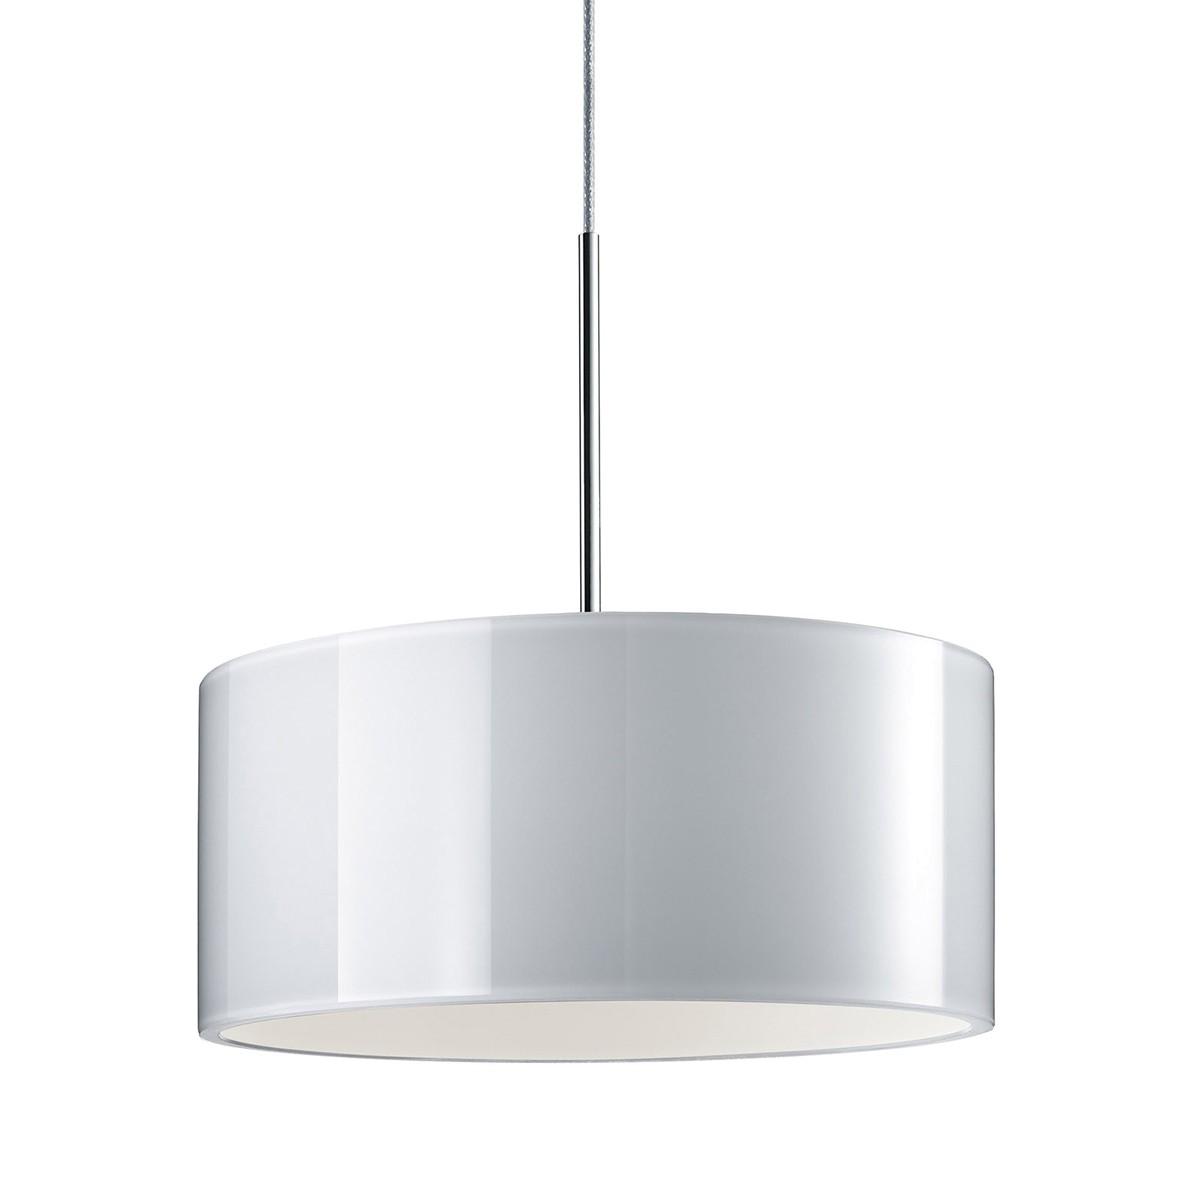 Bruck Duolare Cantara Glas Chrom Ø: 19 cm, LED Pendelleuchte, Glas: weiß